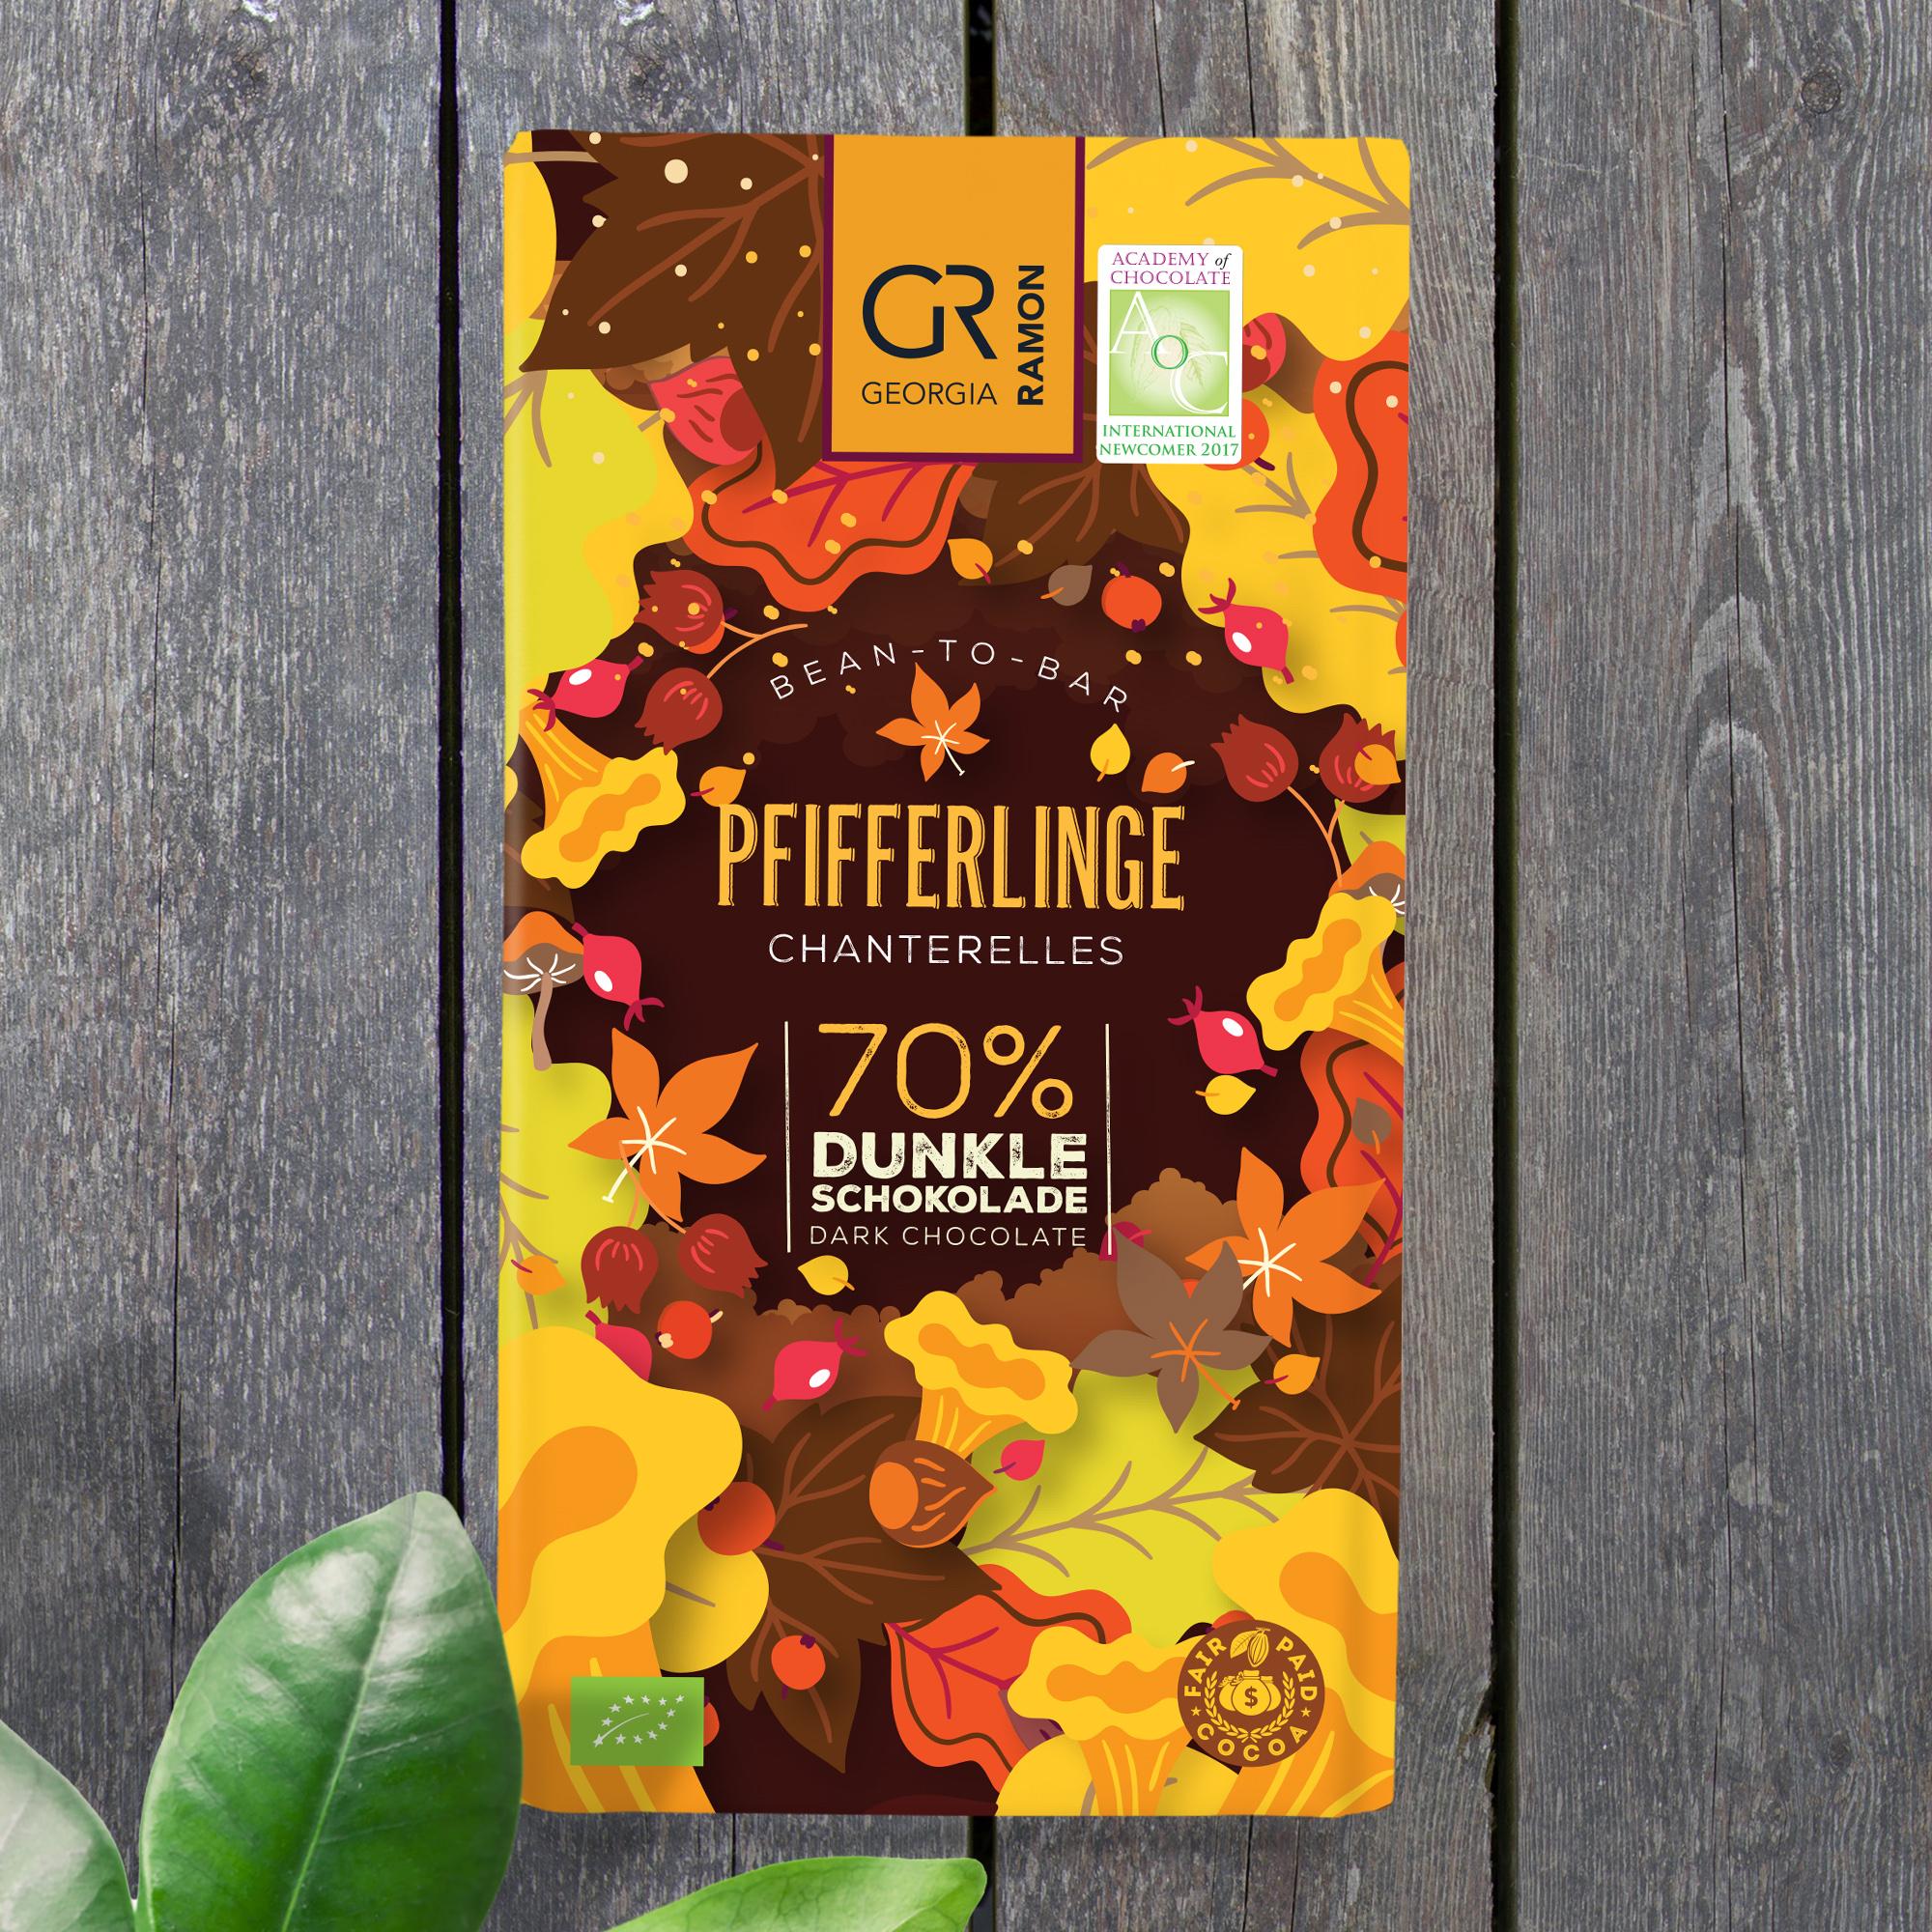 GEORGIA RAMON | Dunkle Schokolade »Pfifferlinge« 70%